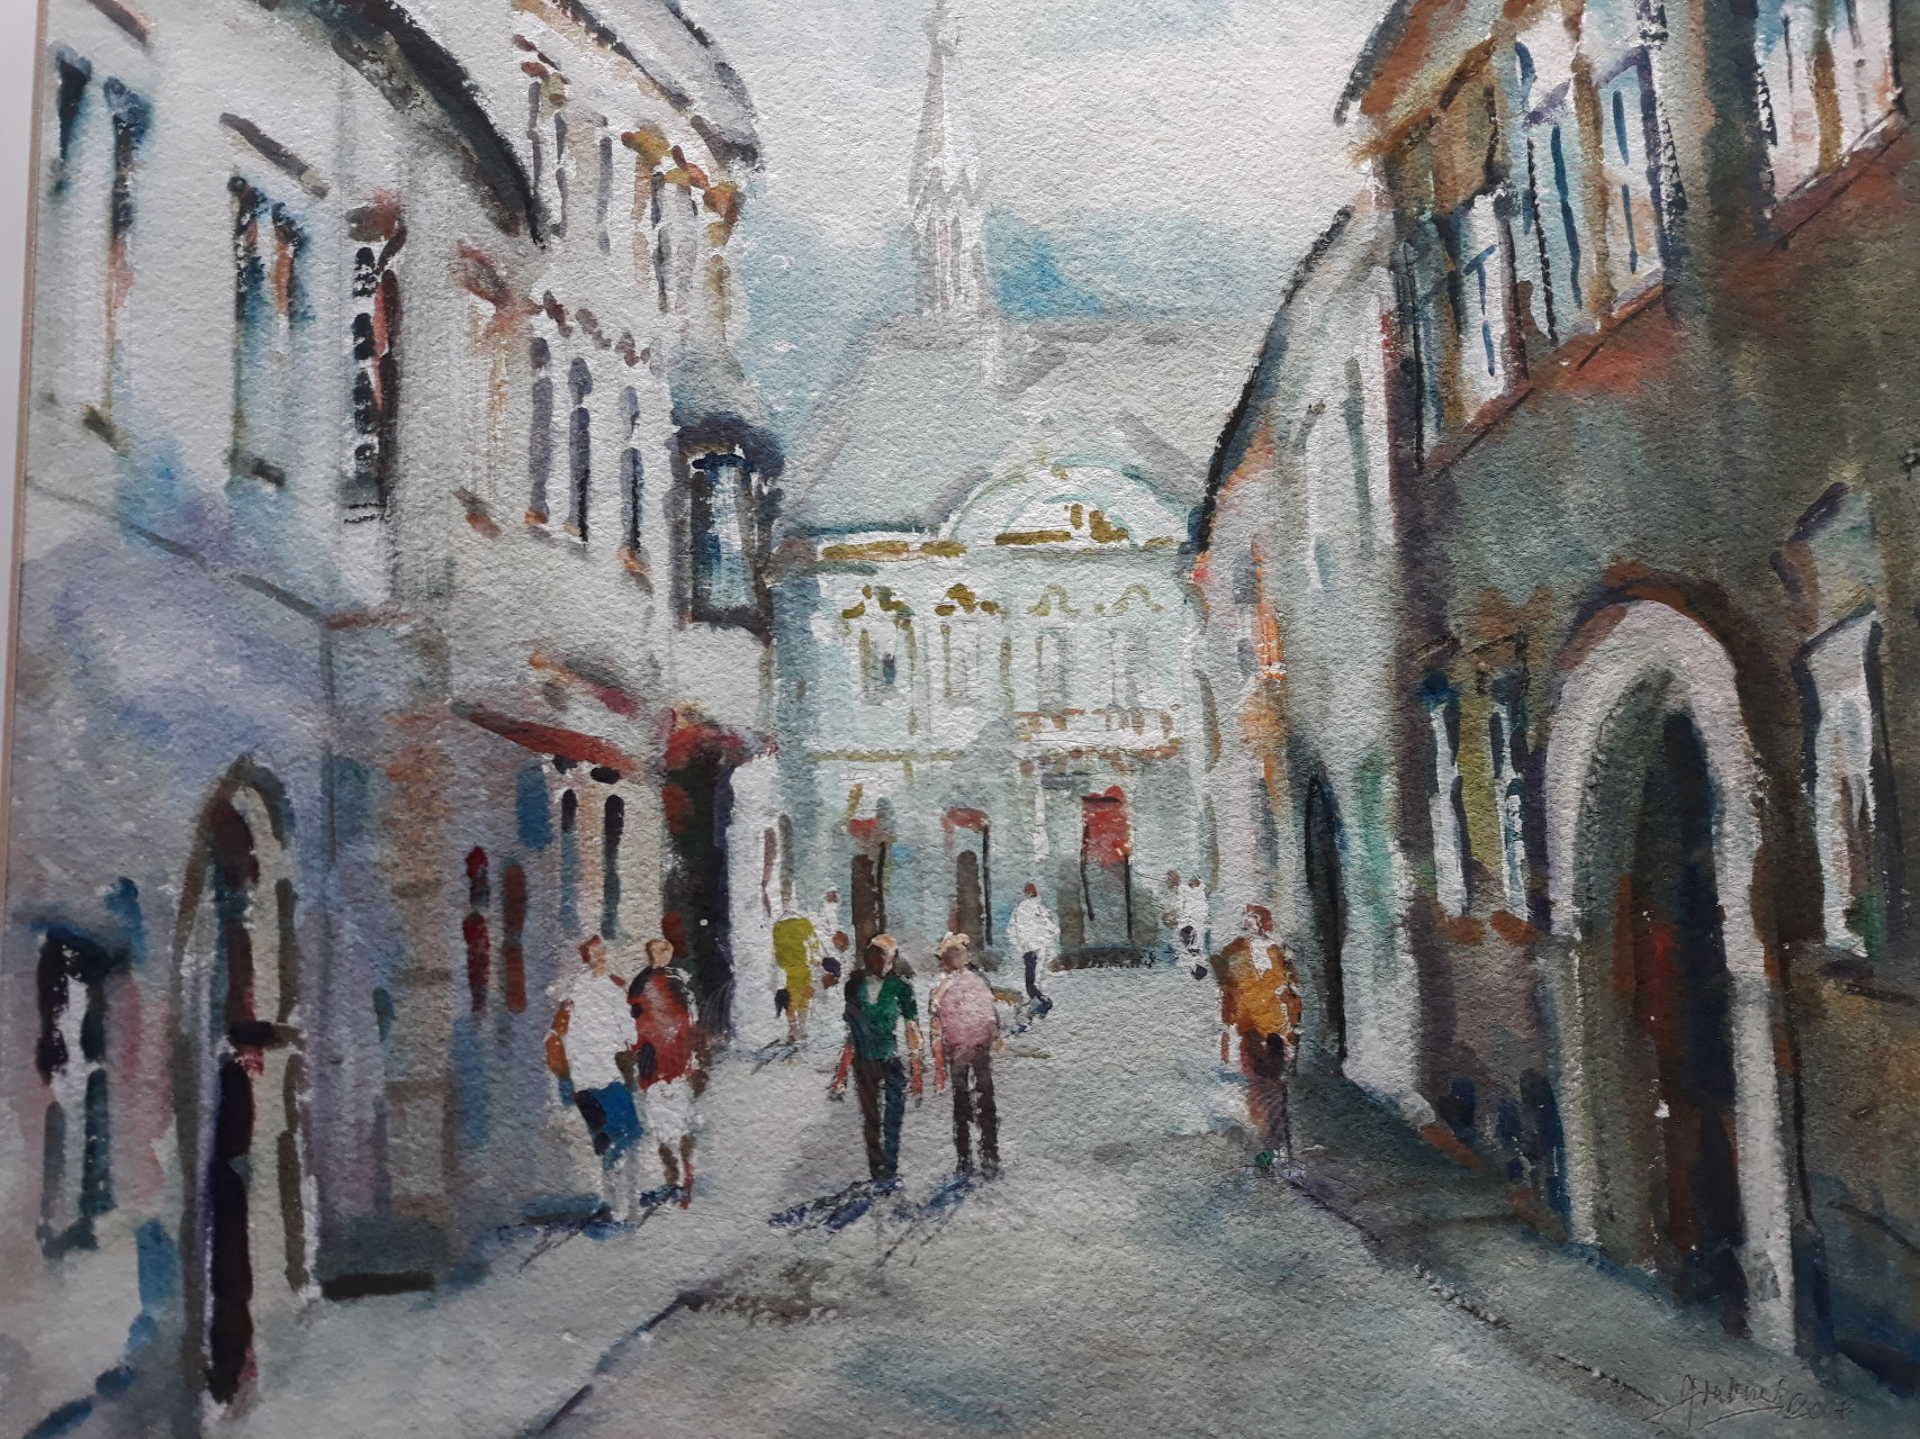 Grabner József akvarellje a soproni Templom utcáról.